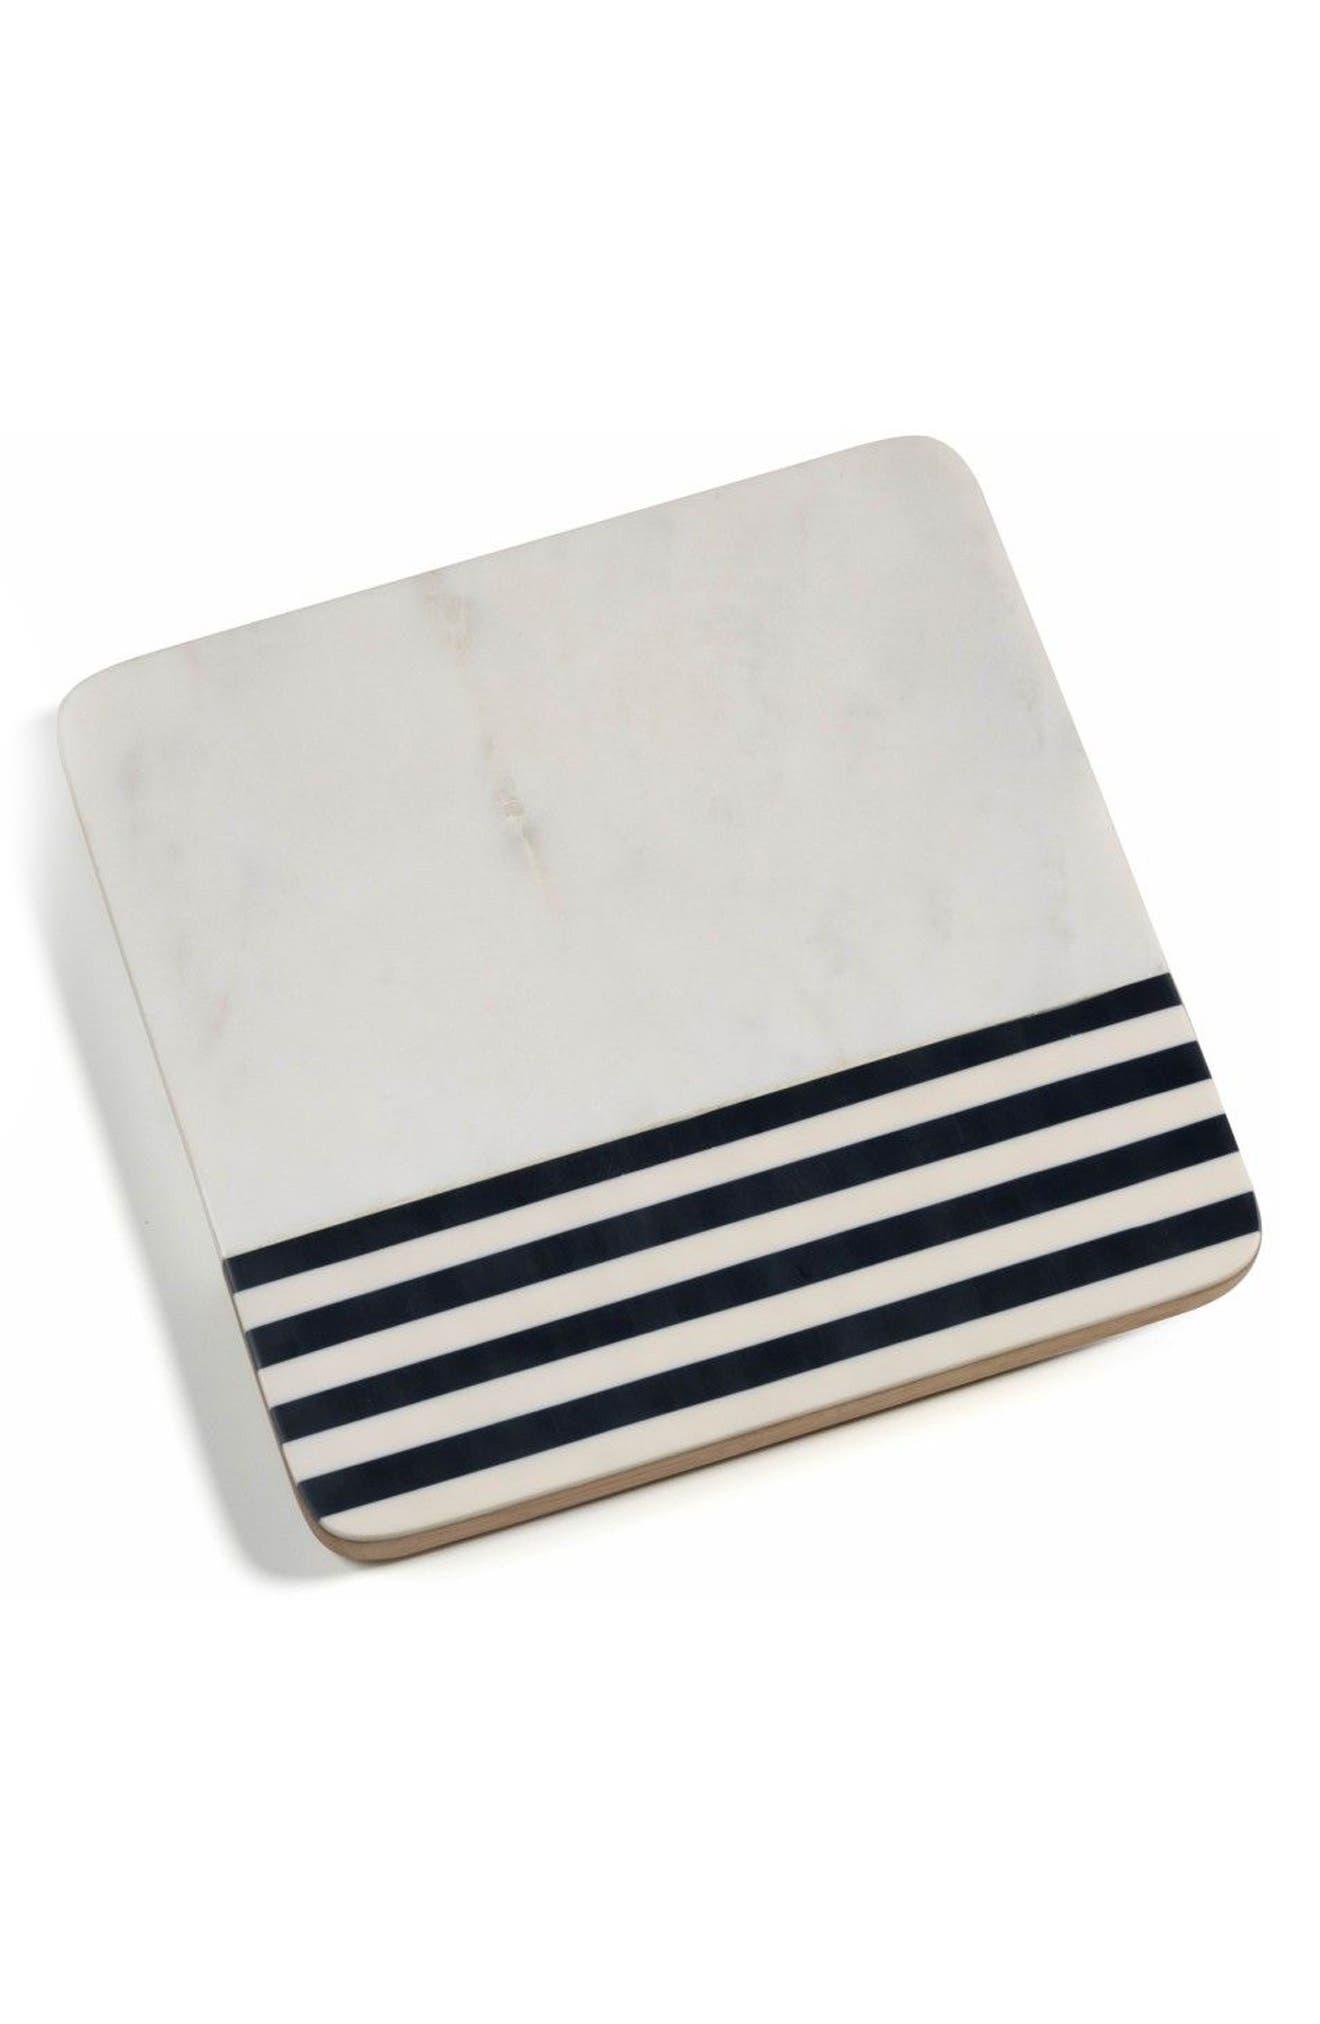 Marine Marble & Wood Cheese Board,                             Main thumbnail 1, color,                             100